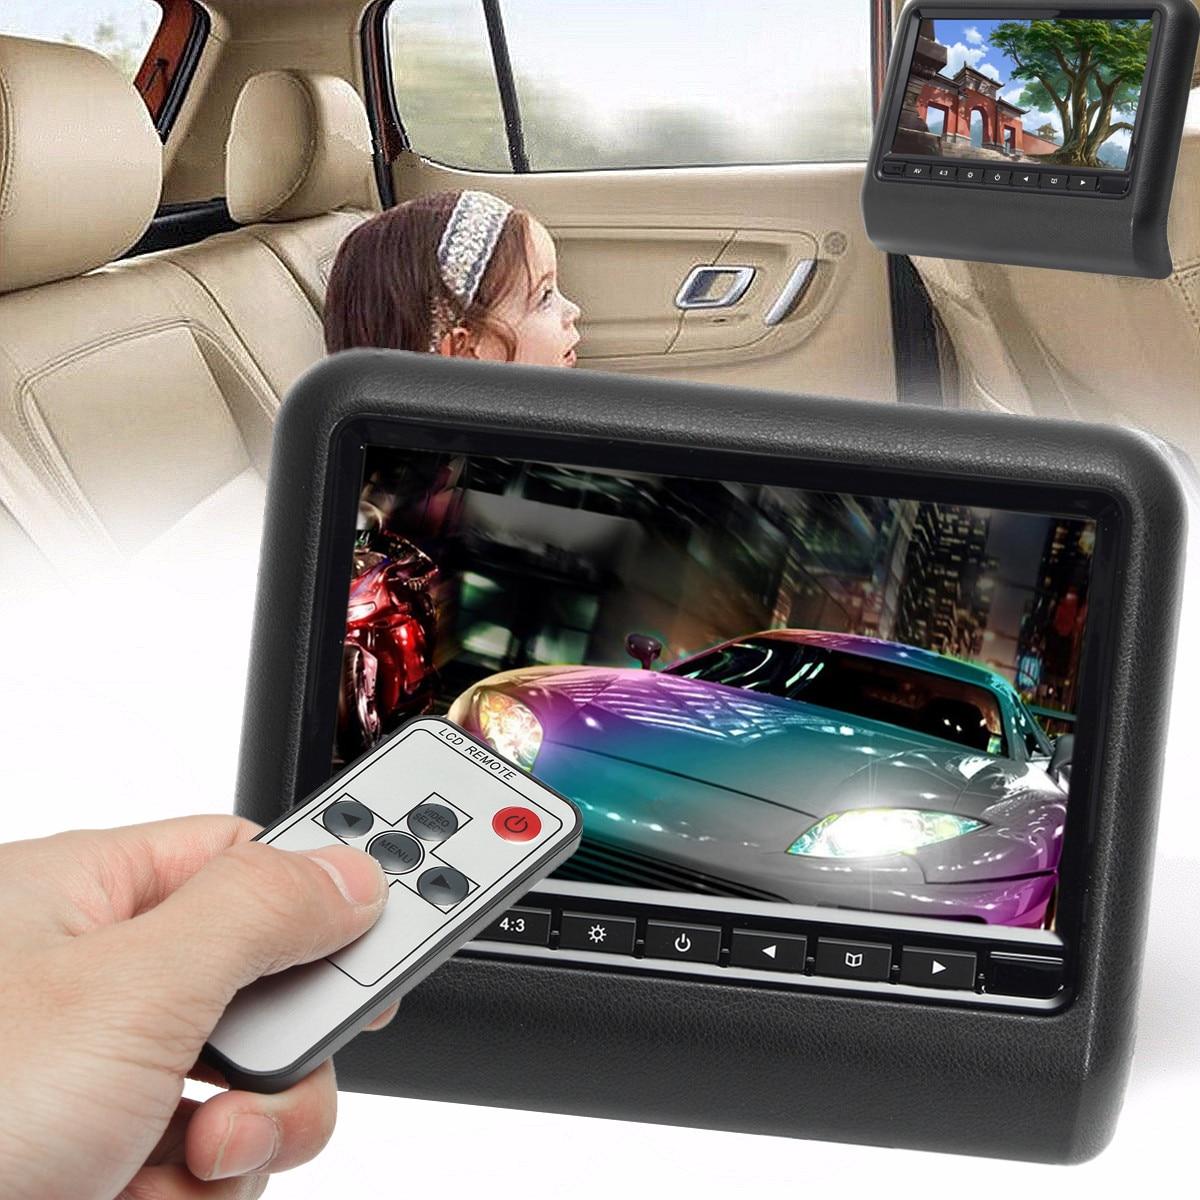 DC 12V 5W 9 Inch Car Headrest Backseat Monitor DVD Video Player Display LCD Screen Mount PAL/NTSC Image Format 2 Way Video Input cse 826be1c r741jbod